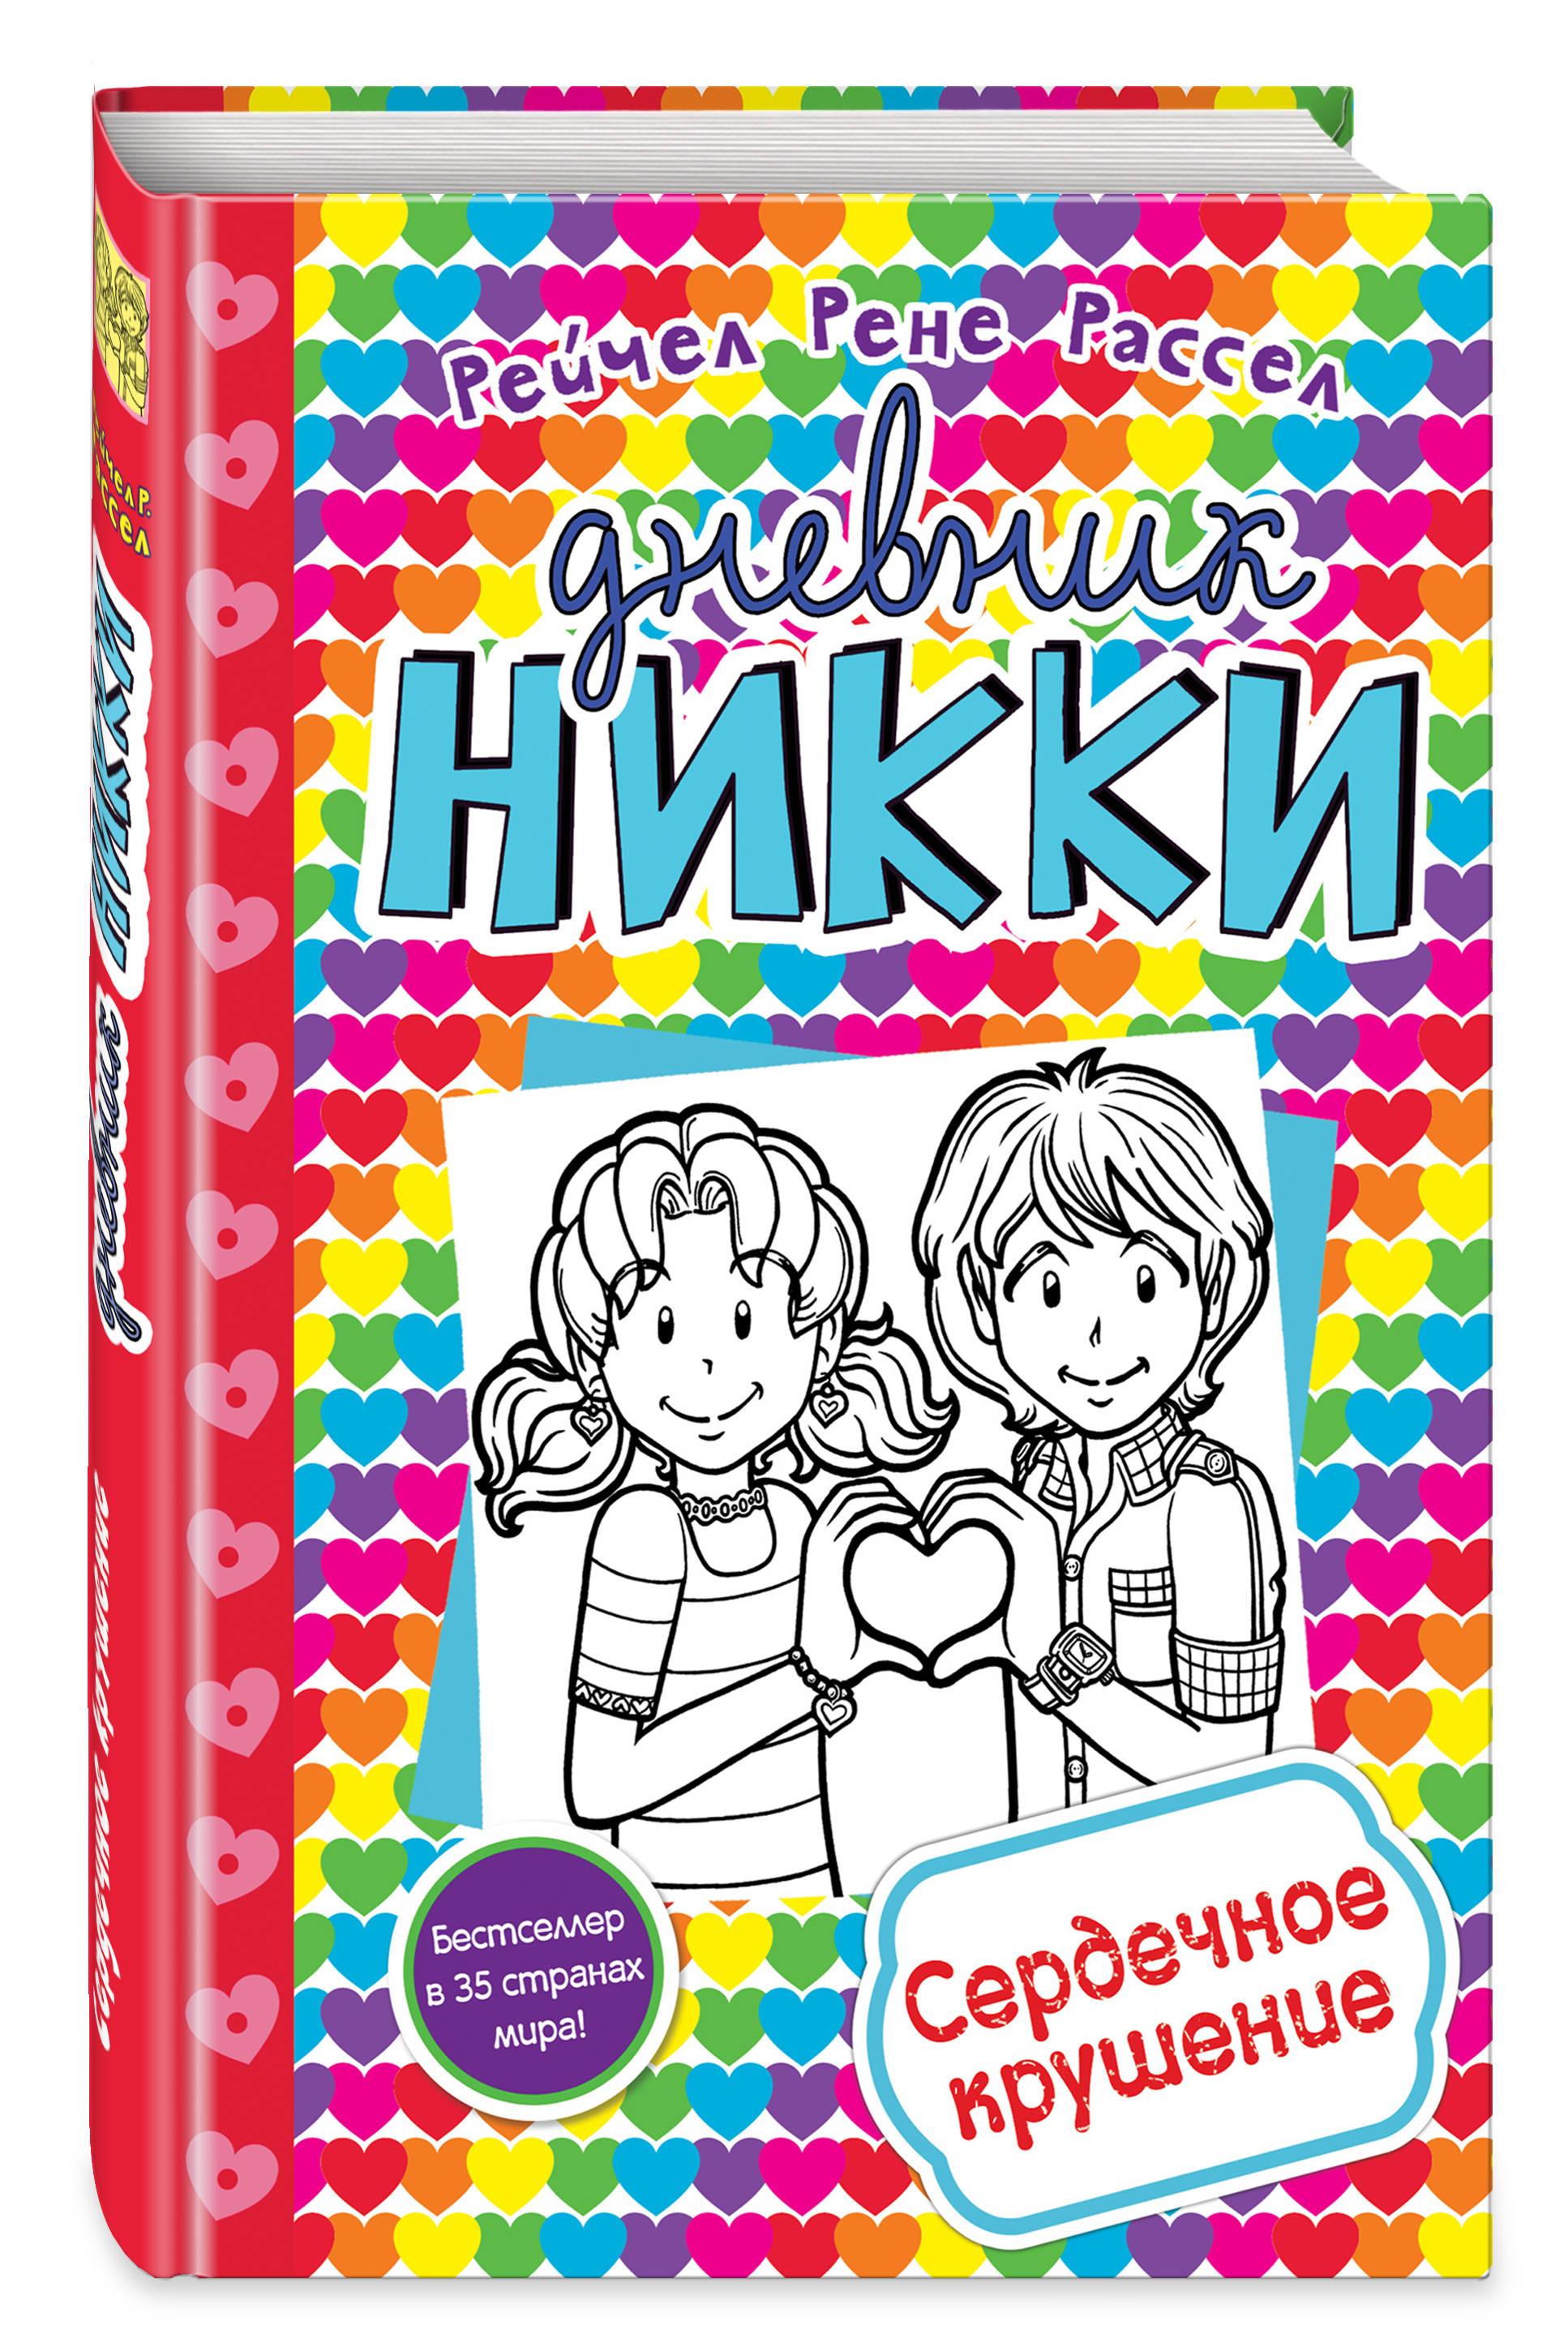 Дневник Никки - новинка (у.н.) новинка